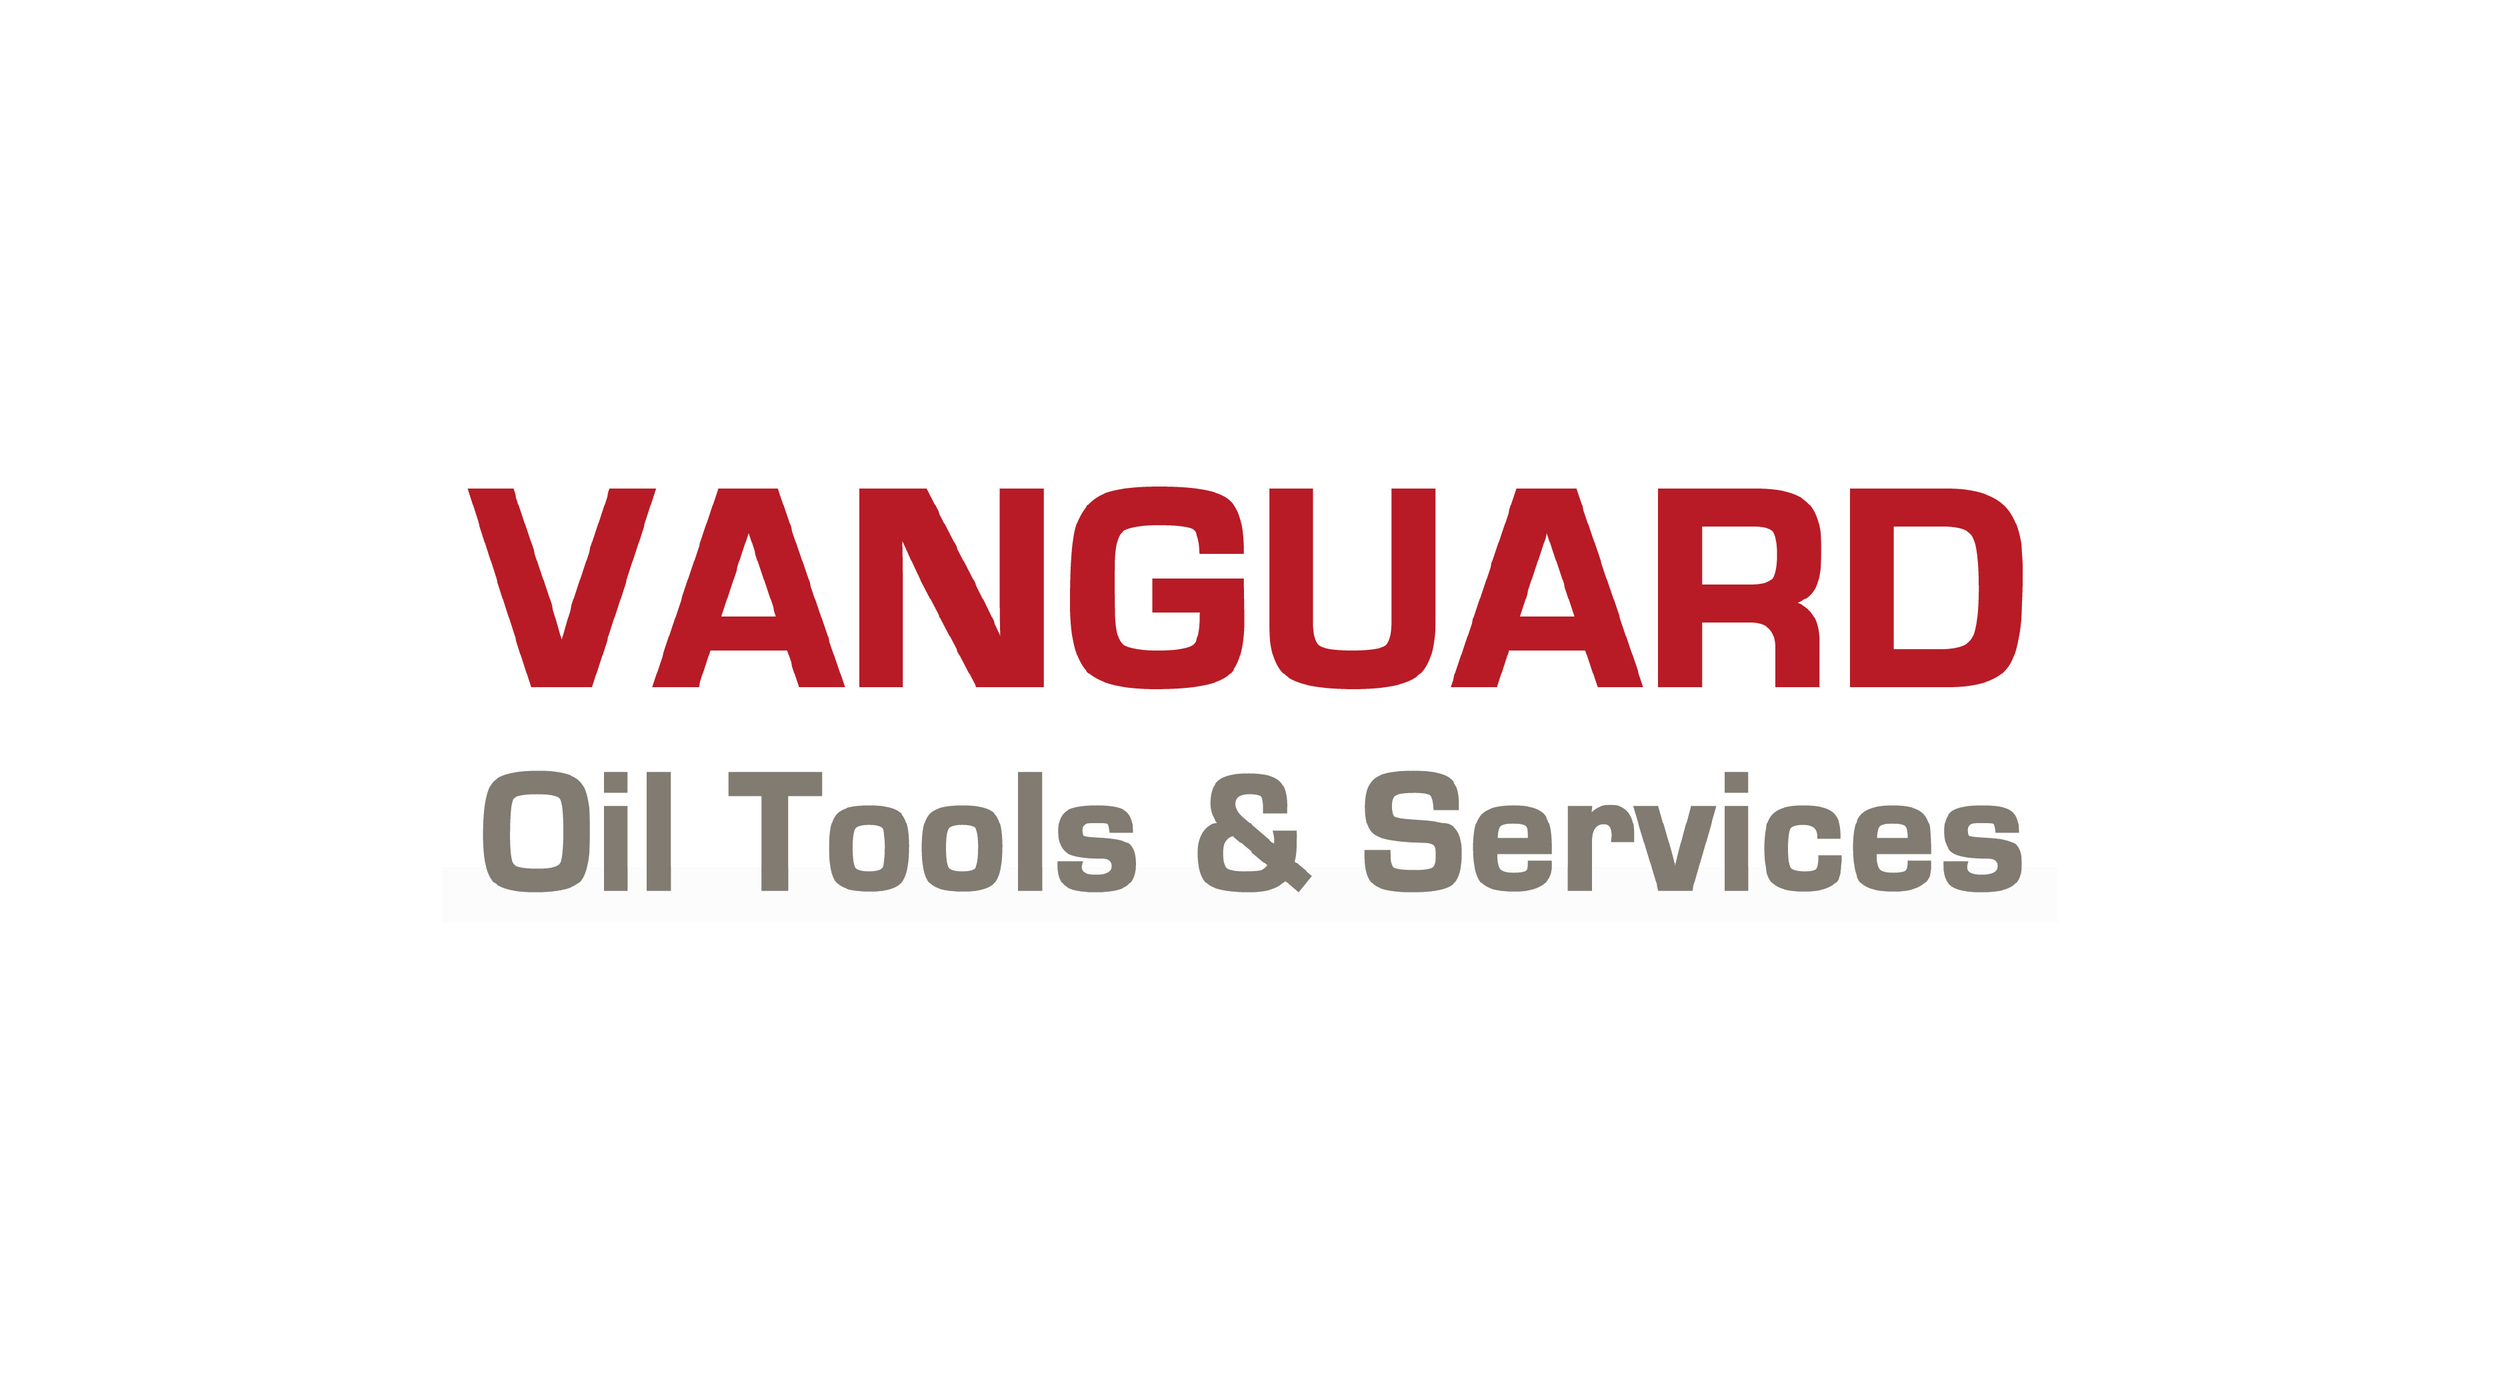 asset-logo-grid_vanguard.png